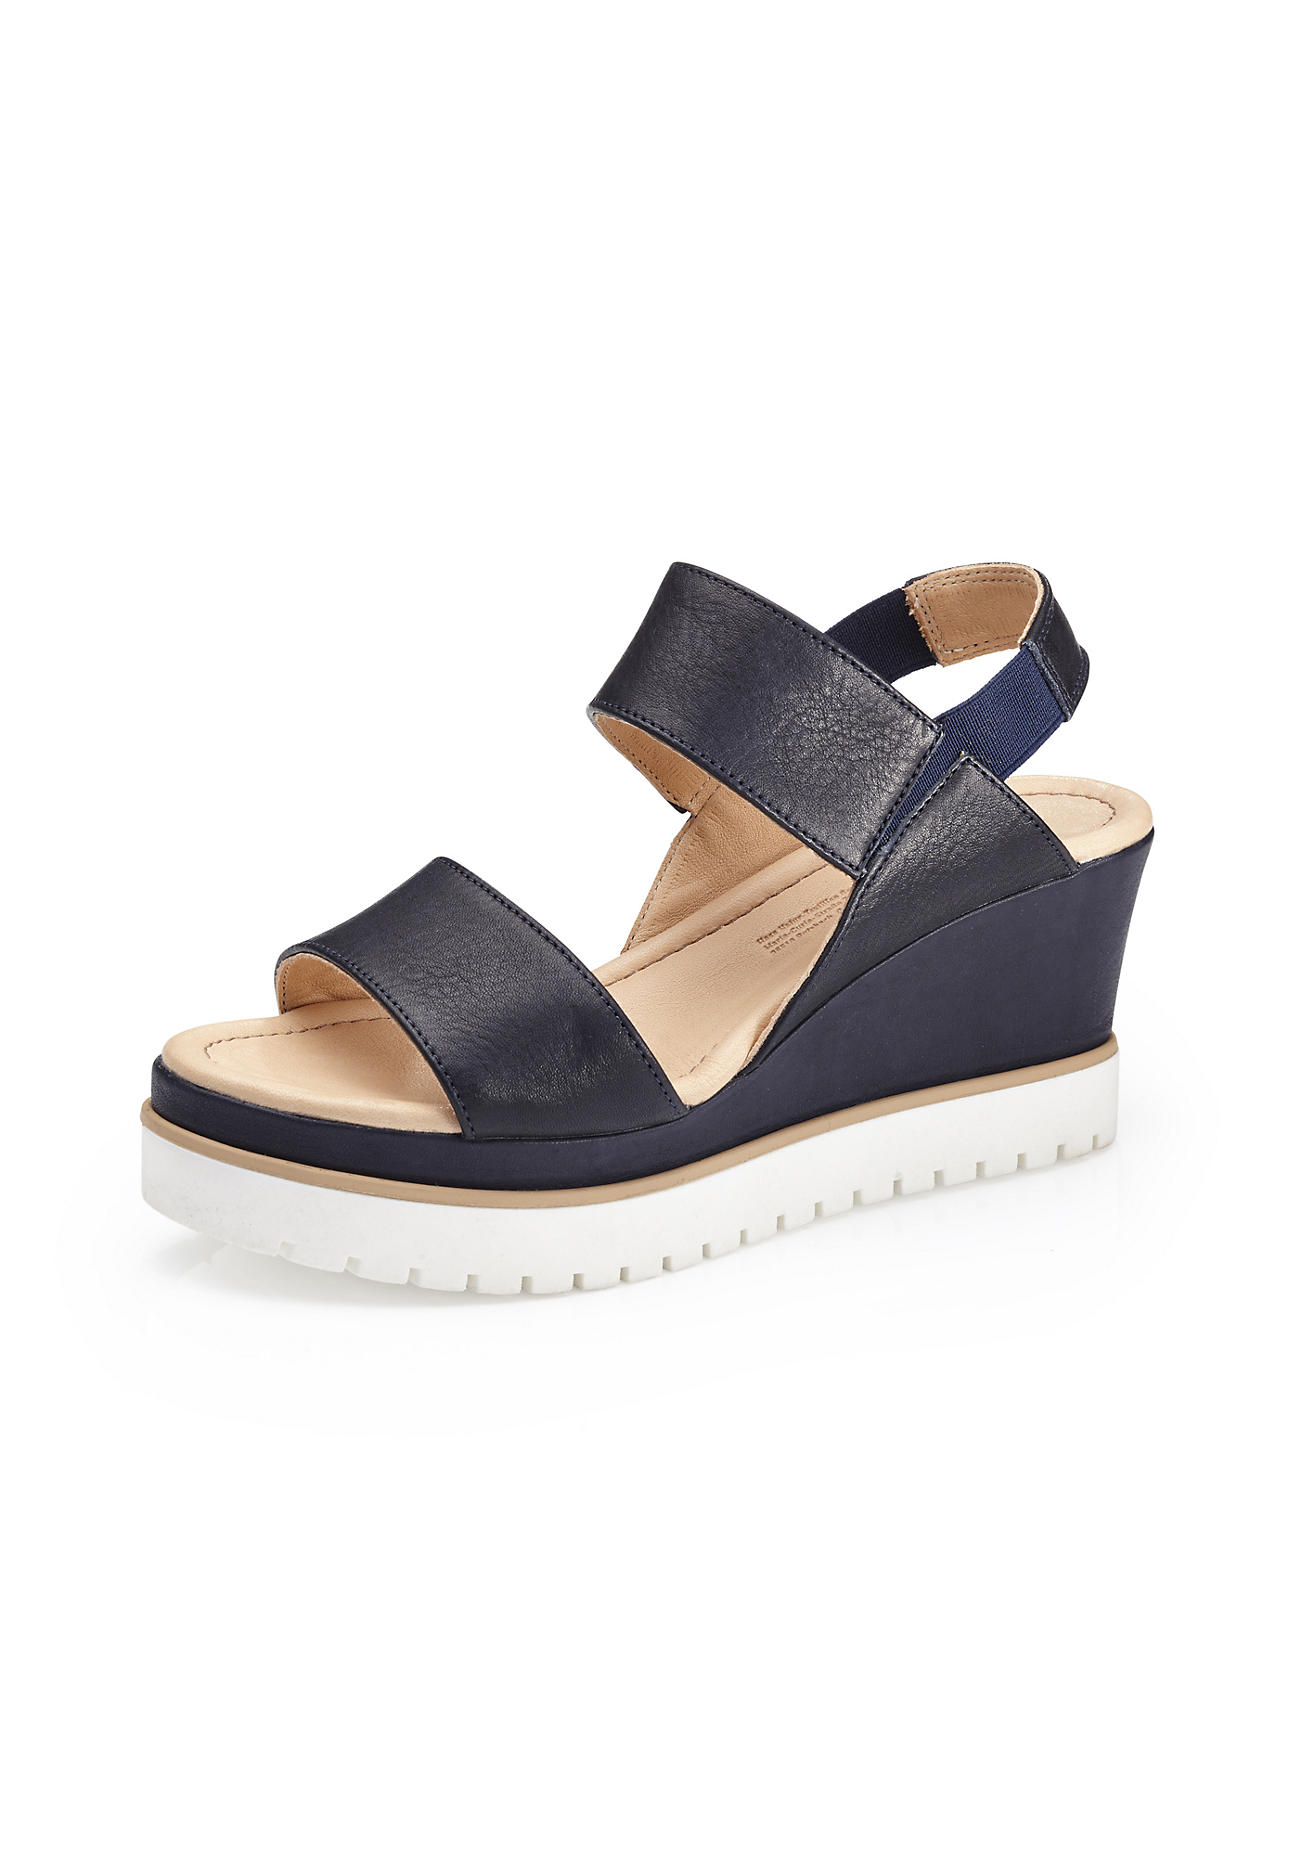 hessnatur Damen Damen Sandalette aus Leder – blau – Größe 41